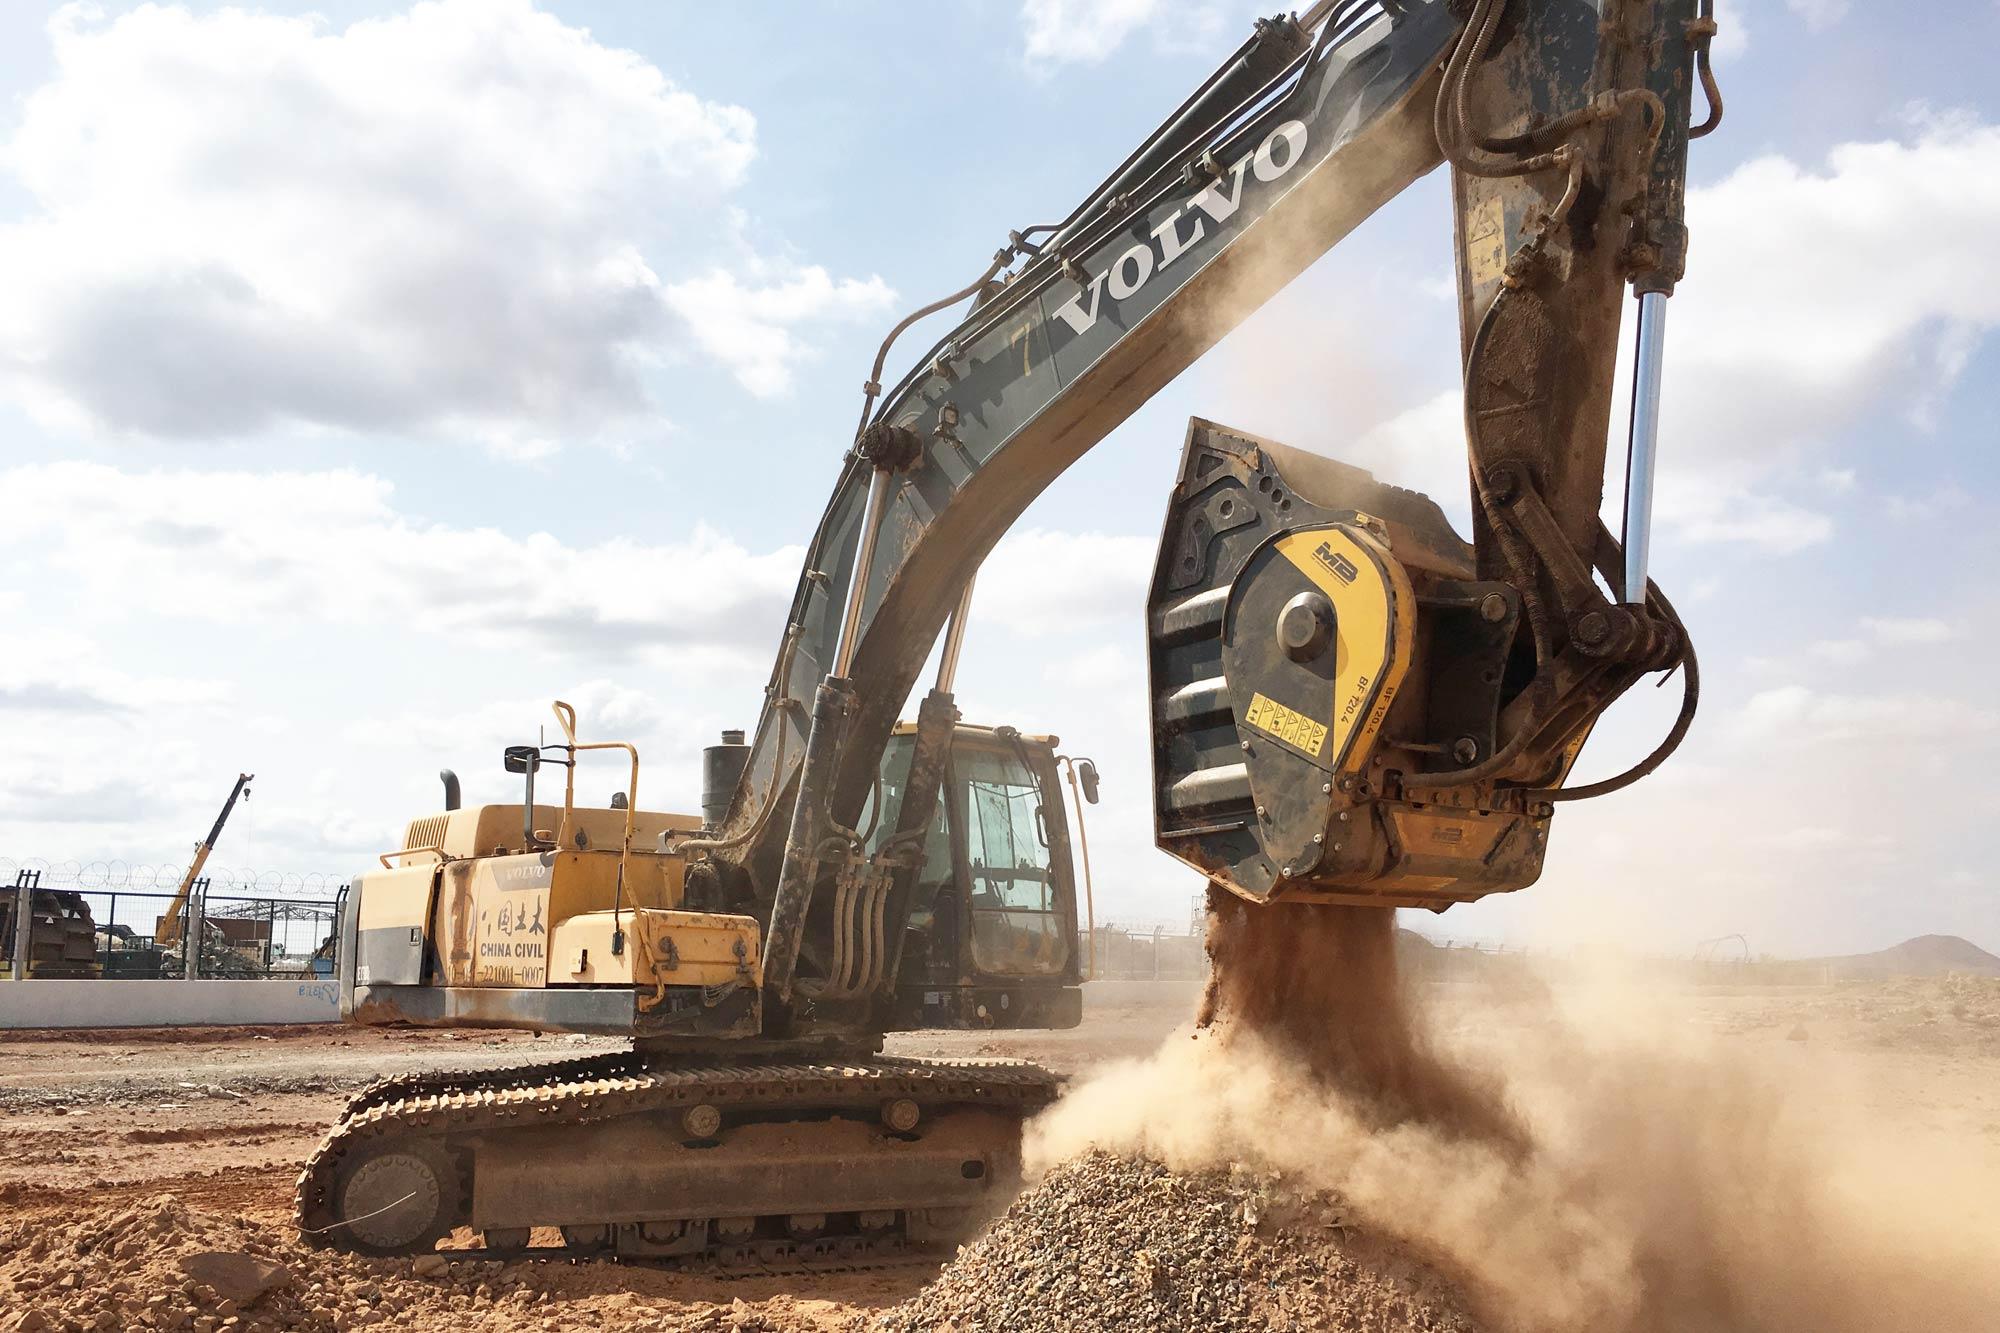 Crushing basalt with MB Crusher in Djibouti